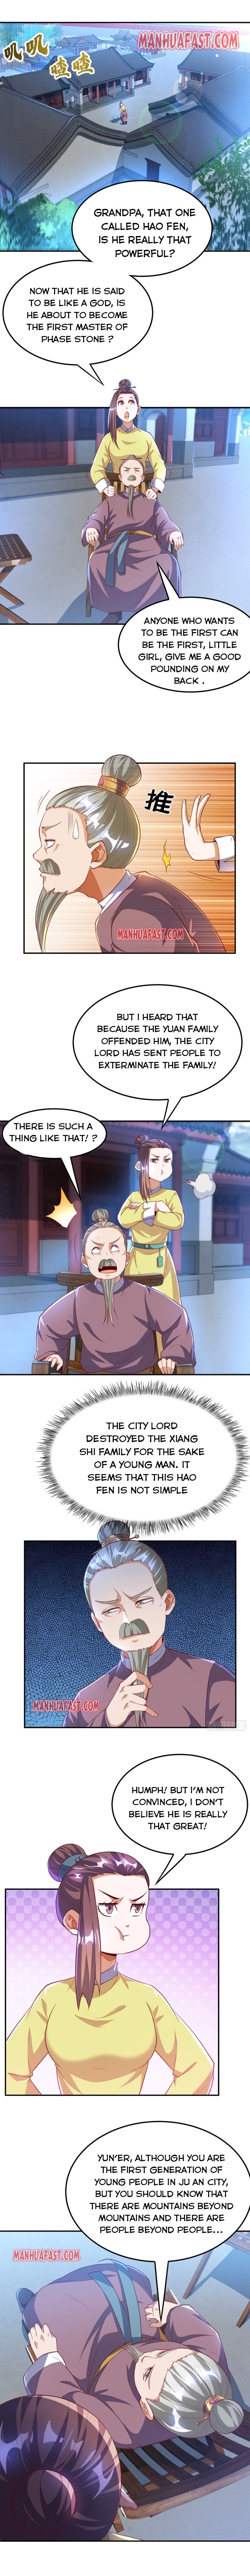 https://manga.mangadogs.com/comics/pic4/13/39629/3271534/050a0f5860aef4ea0aeebe87548a4ac7.jpg Page 1